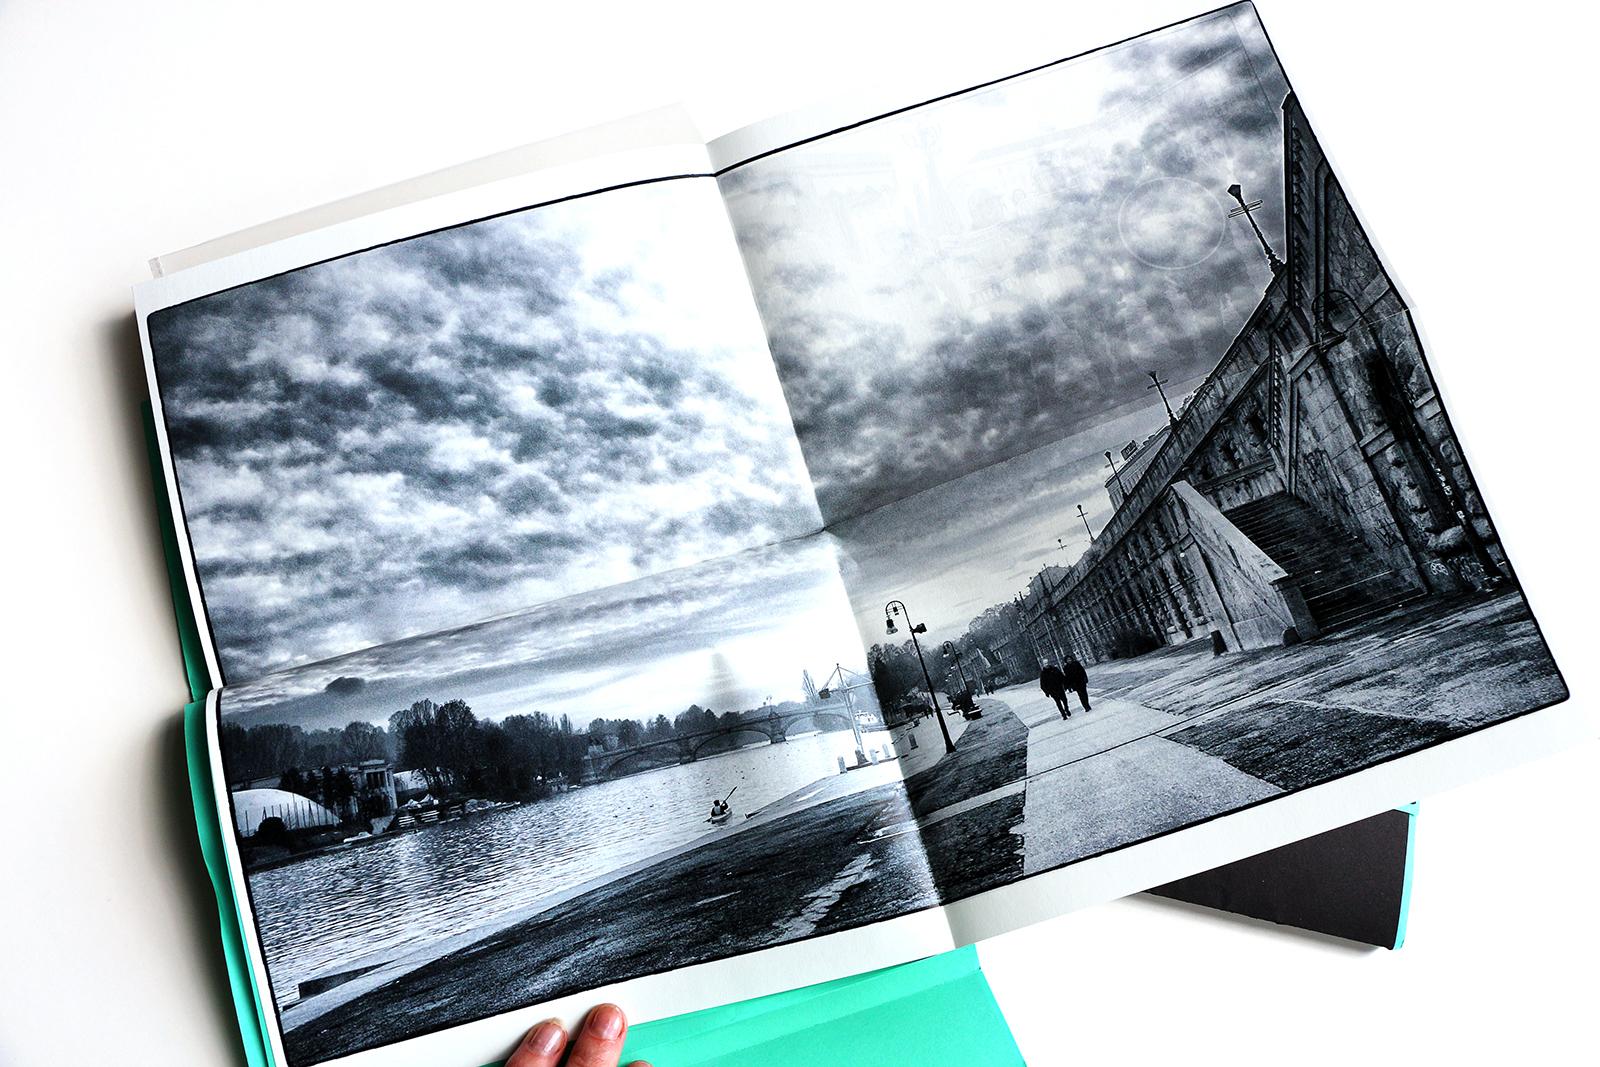 Welkom Street Photography